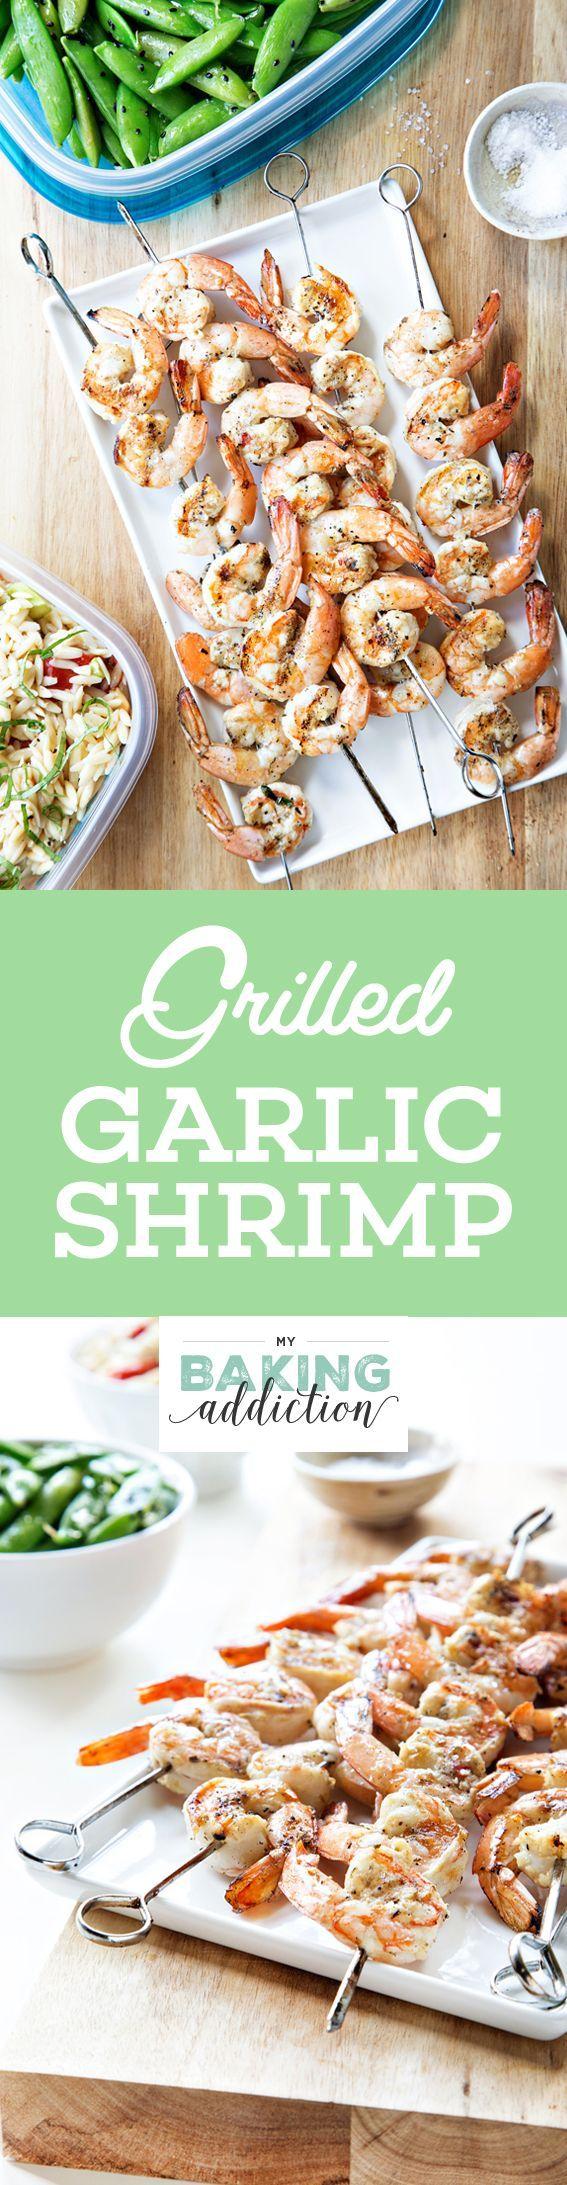 Grilled Garlic Basil Shrimp has a simple marinade of garlic, herbs ...